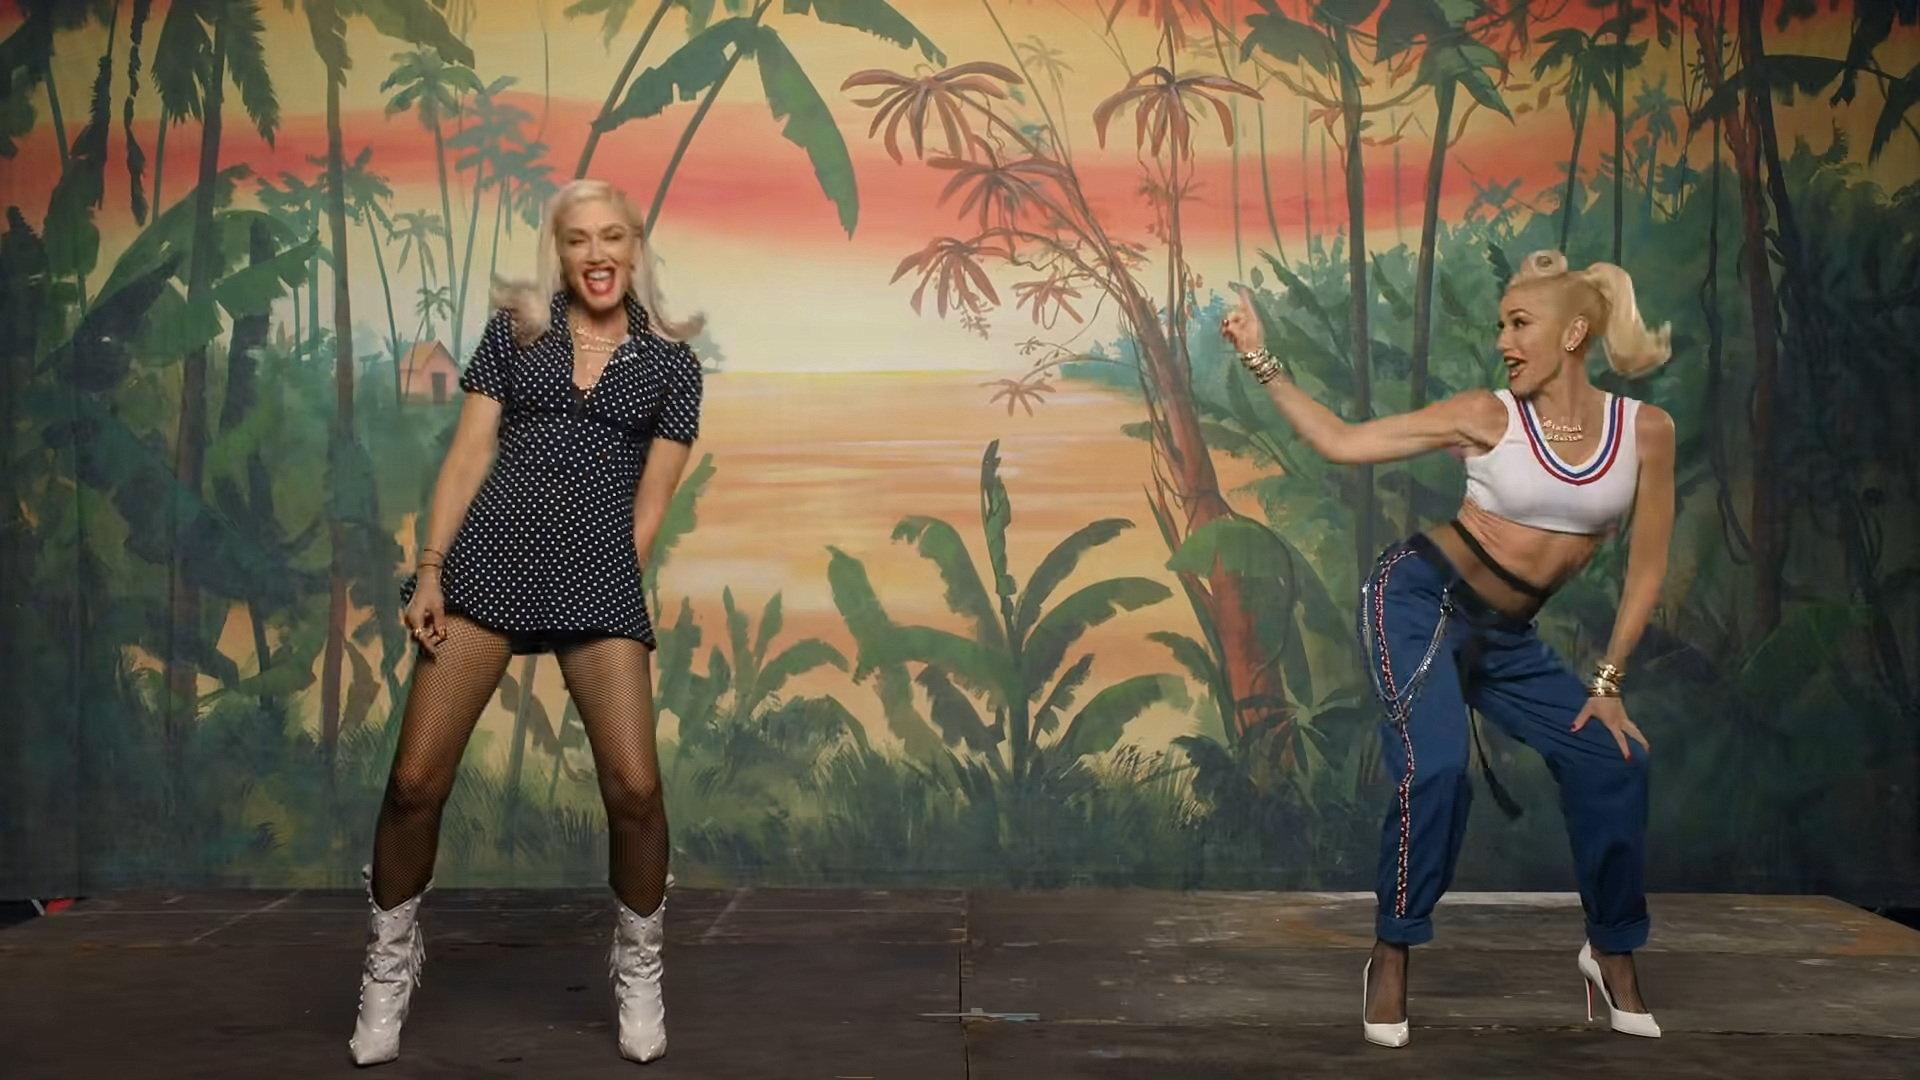 Gwen Stefani - Let Me Reintroduce Myself (Official Video) 2-23 Screenshot